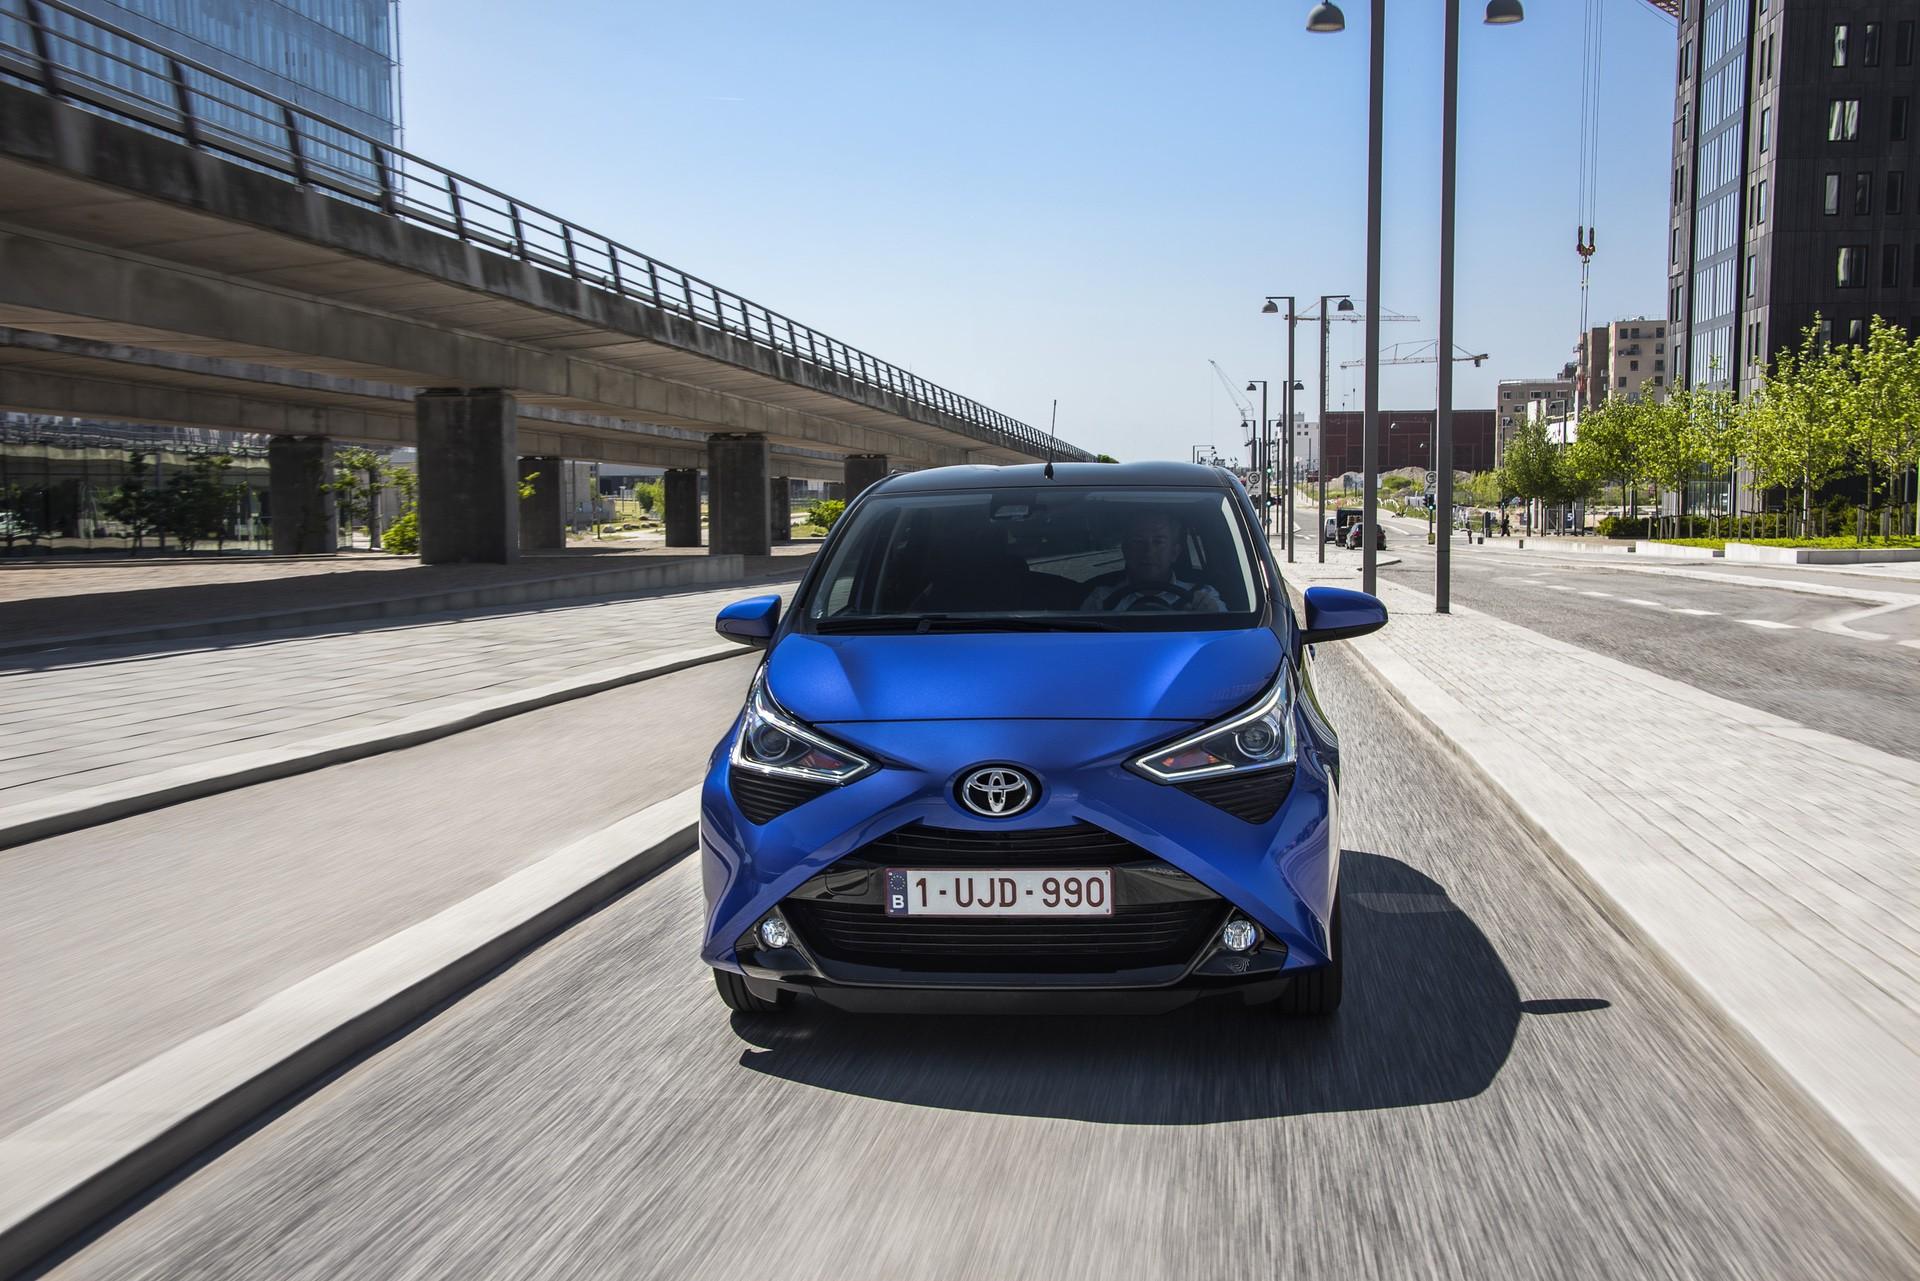 Toyota_Aygo_facelift_presskit_0017